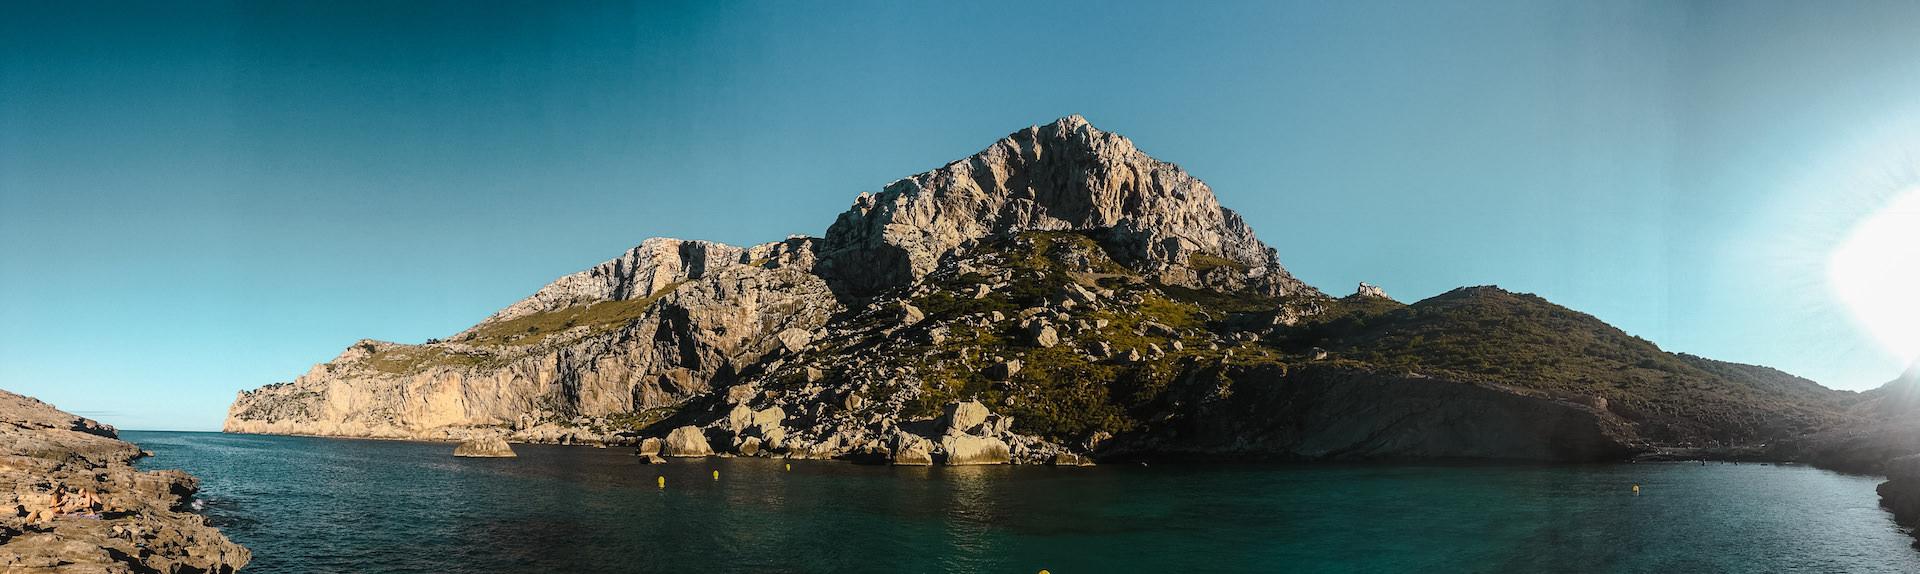 Cala Figuera Mallorca Panorama